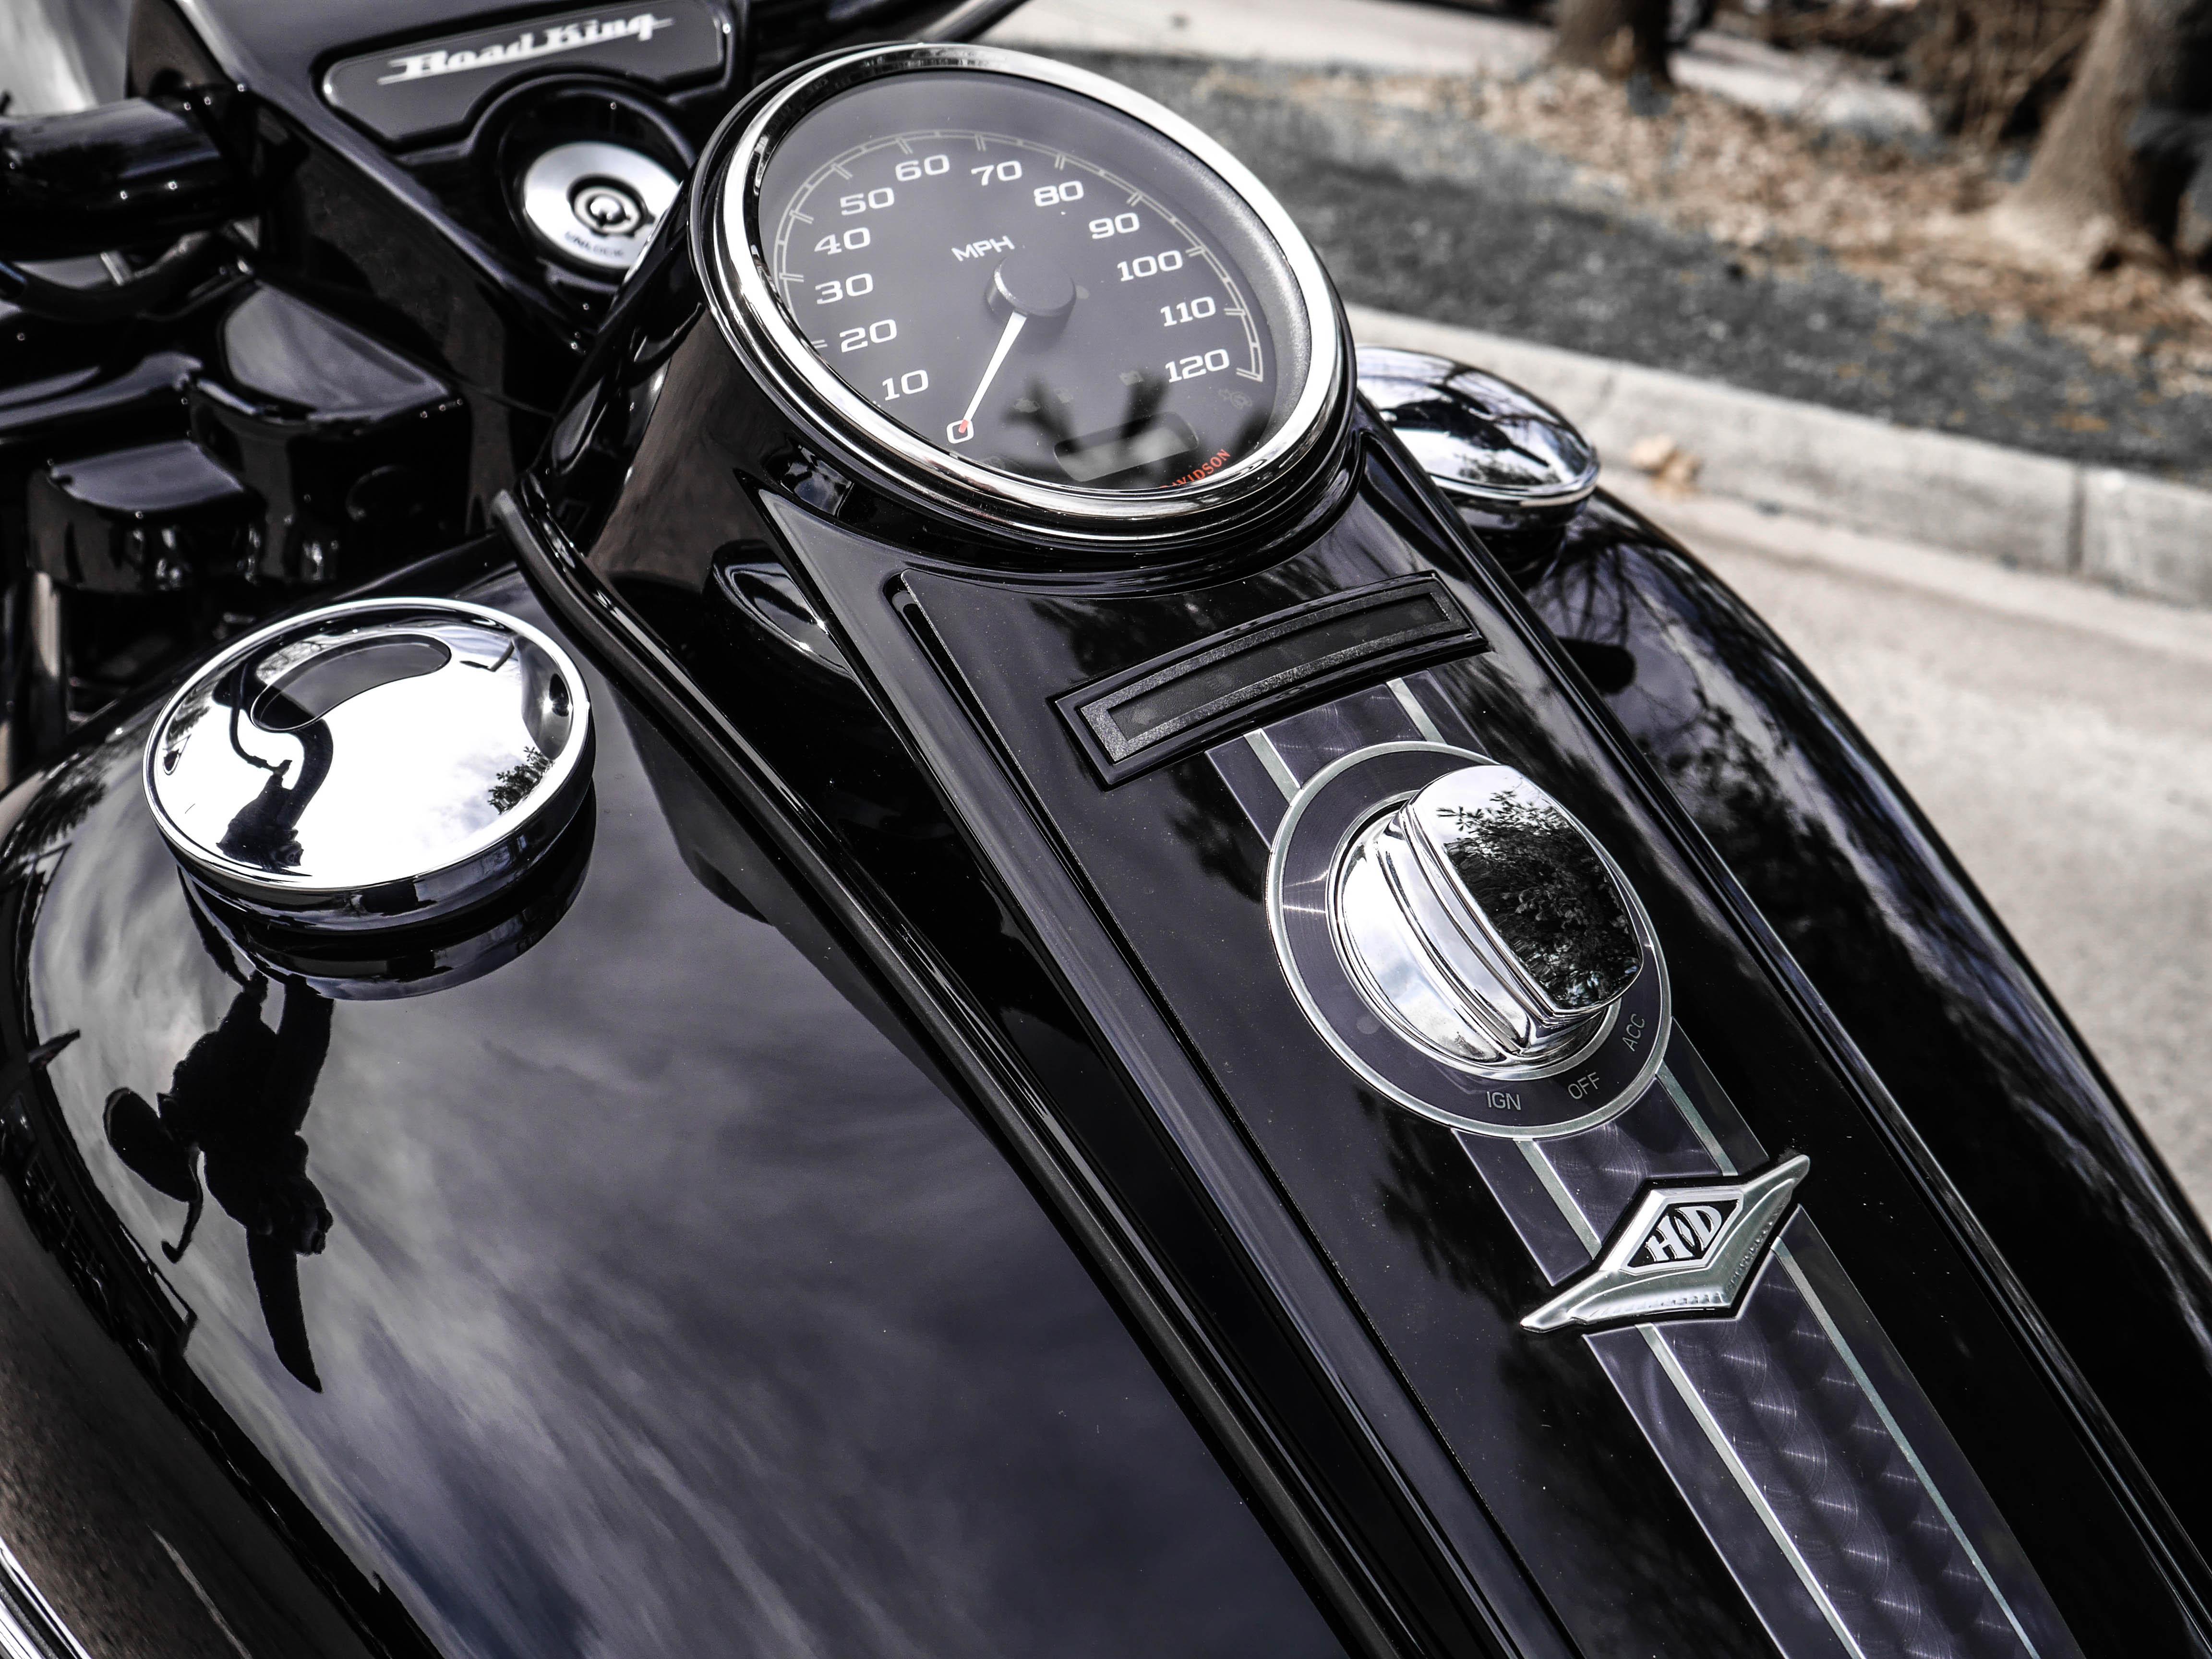 New 2019 Harley-Davidson Special in Franklin #T655418